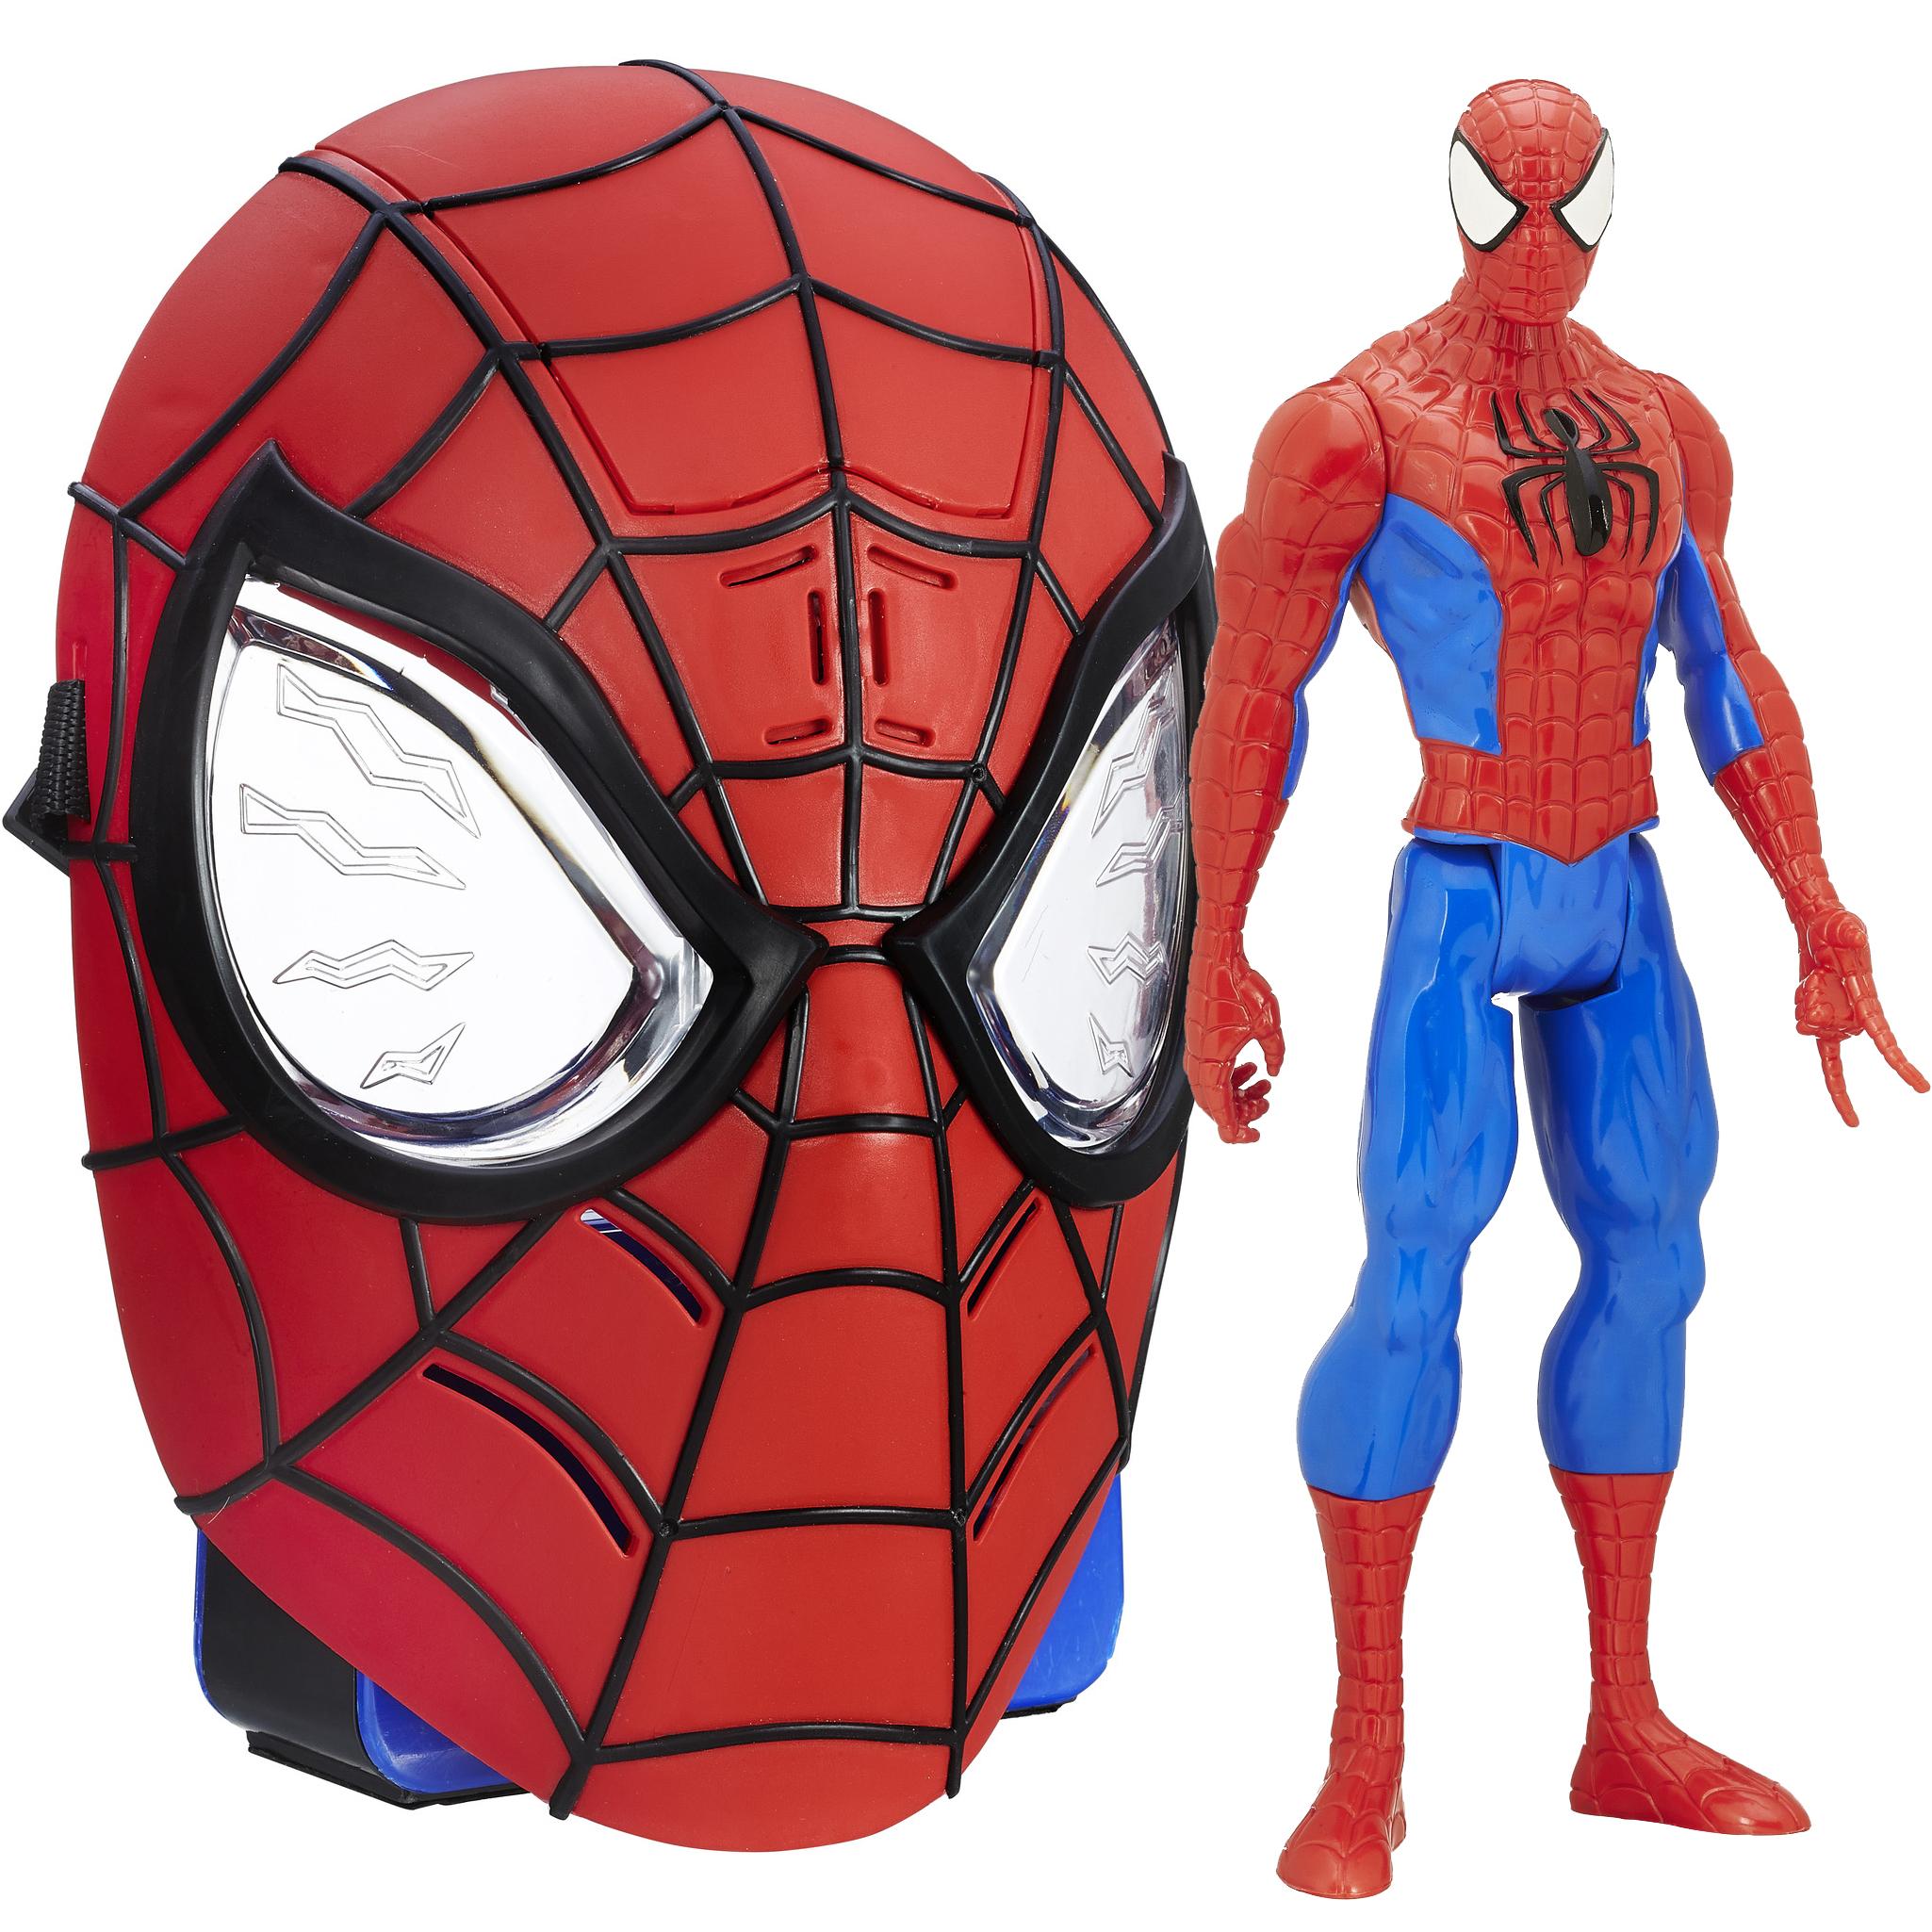 Marvel Spider-Man Titan Hero Series Spider-Man Figure with Ultimate Spider-Man Sinister Six Spidey Sense Mask